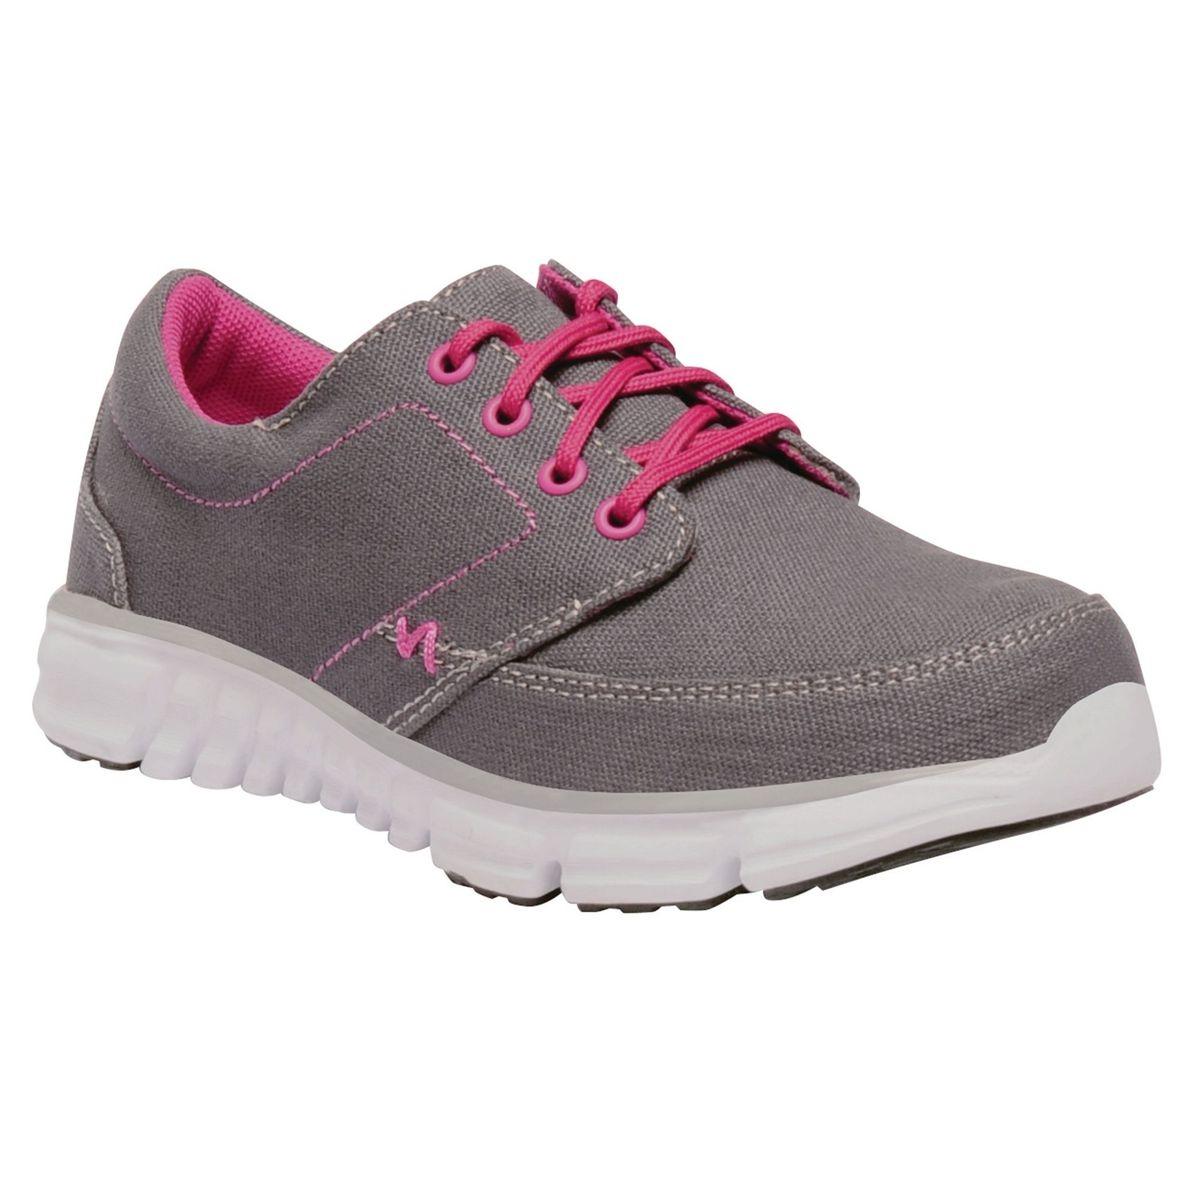 Chaussures de marche MARINE